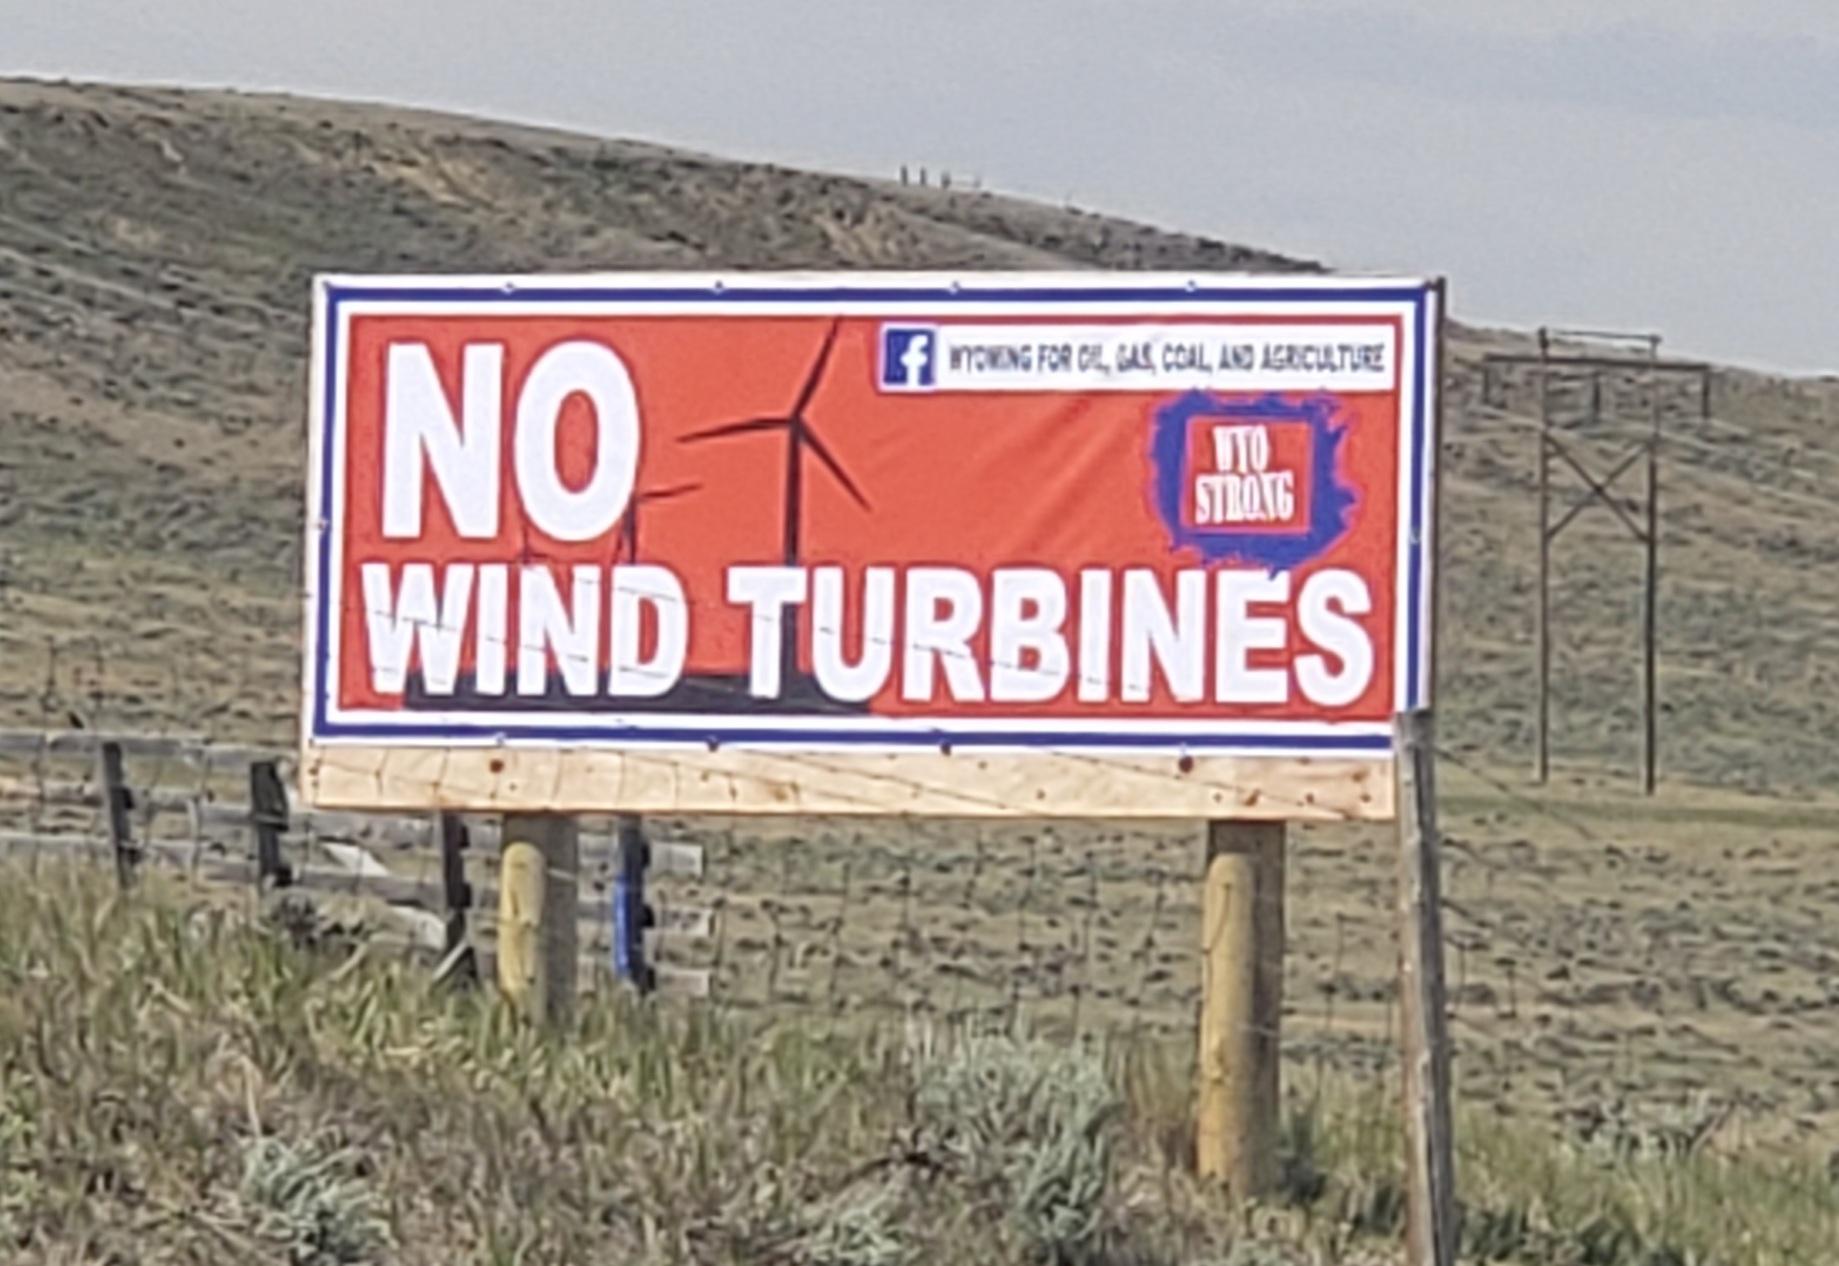 No Wind Turbines billboard stands in the field